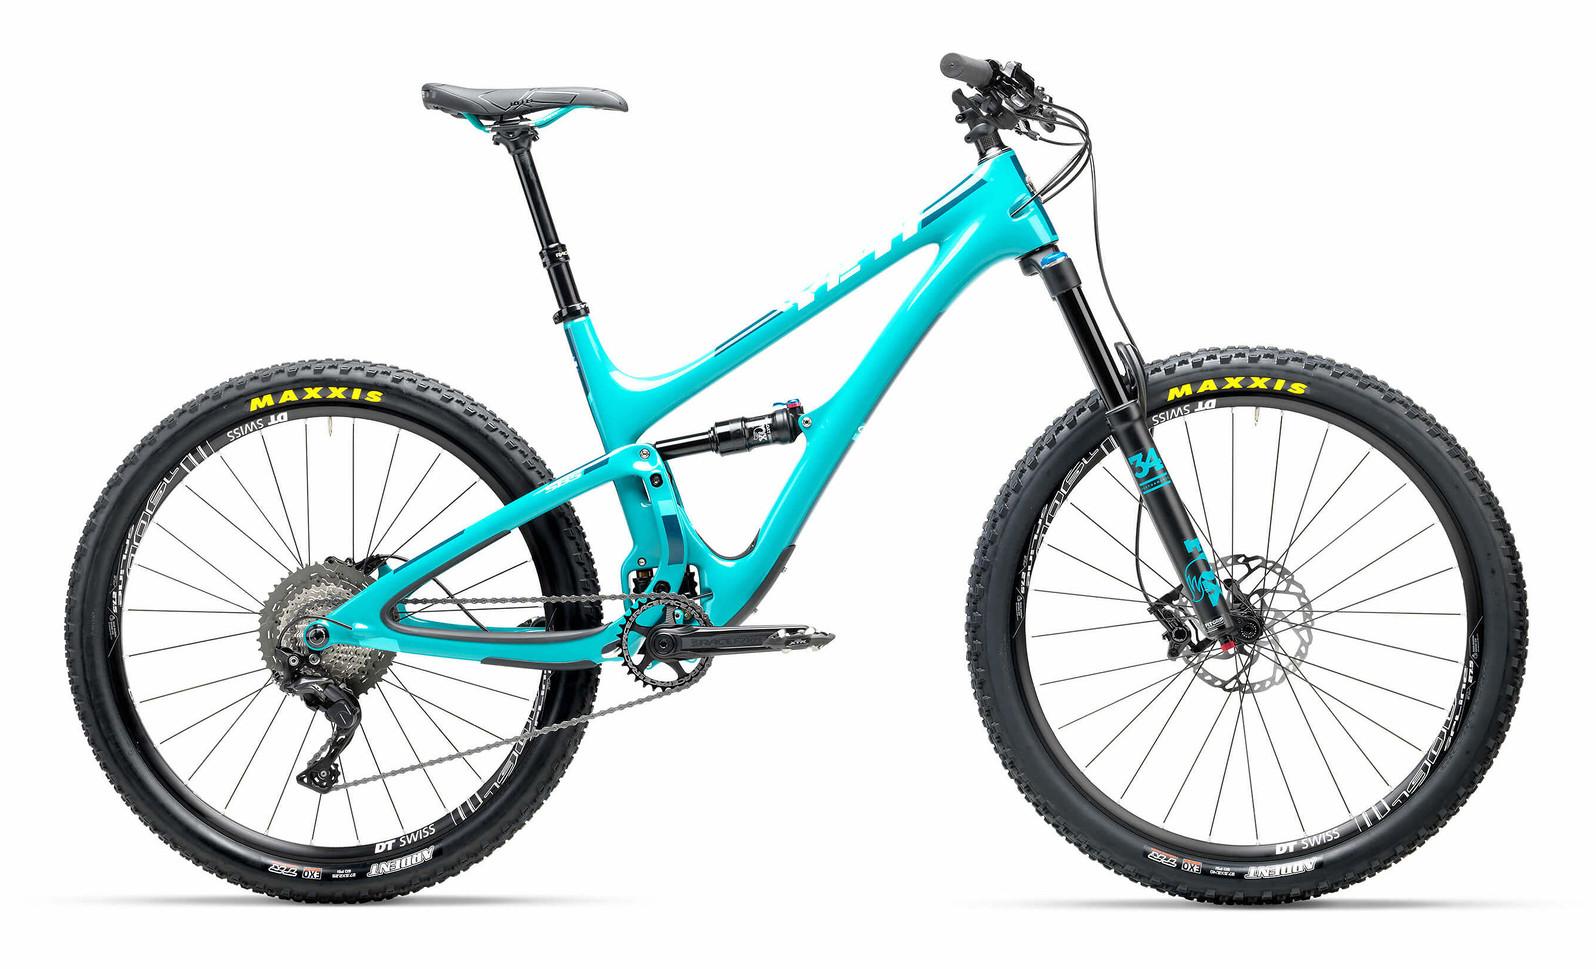 2017 Yeti SB5 Carbon XT/SLX (turquoise)